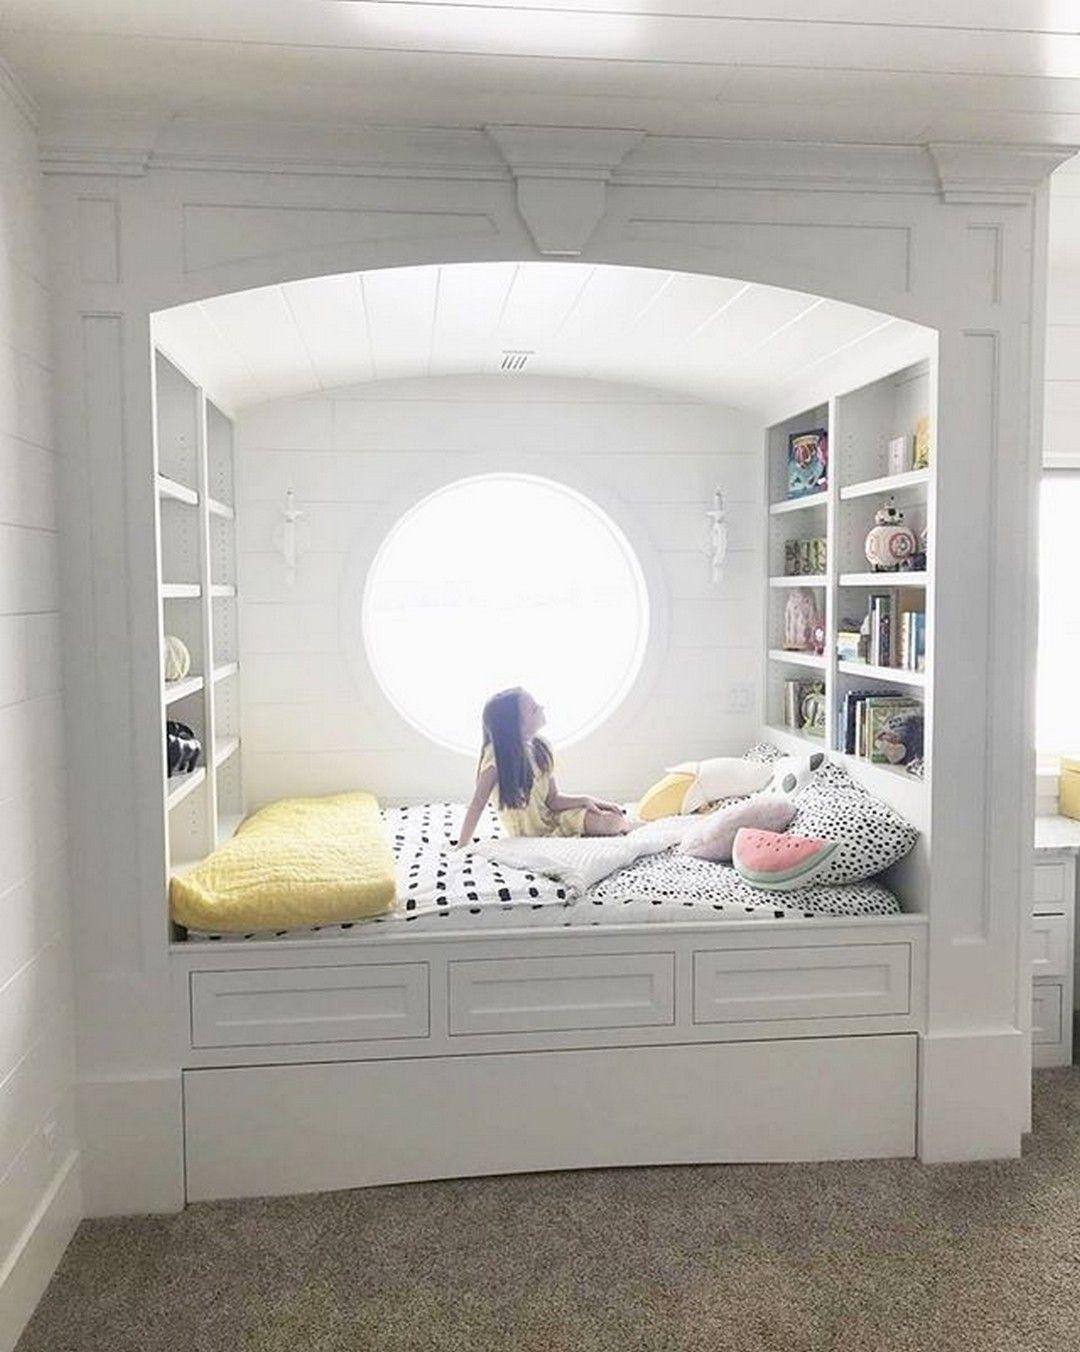 Bedroom Idea - 666251407313462631